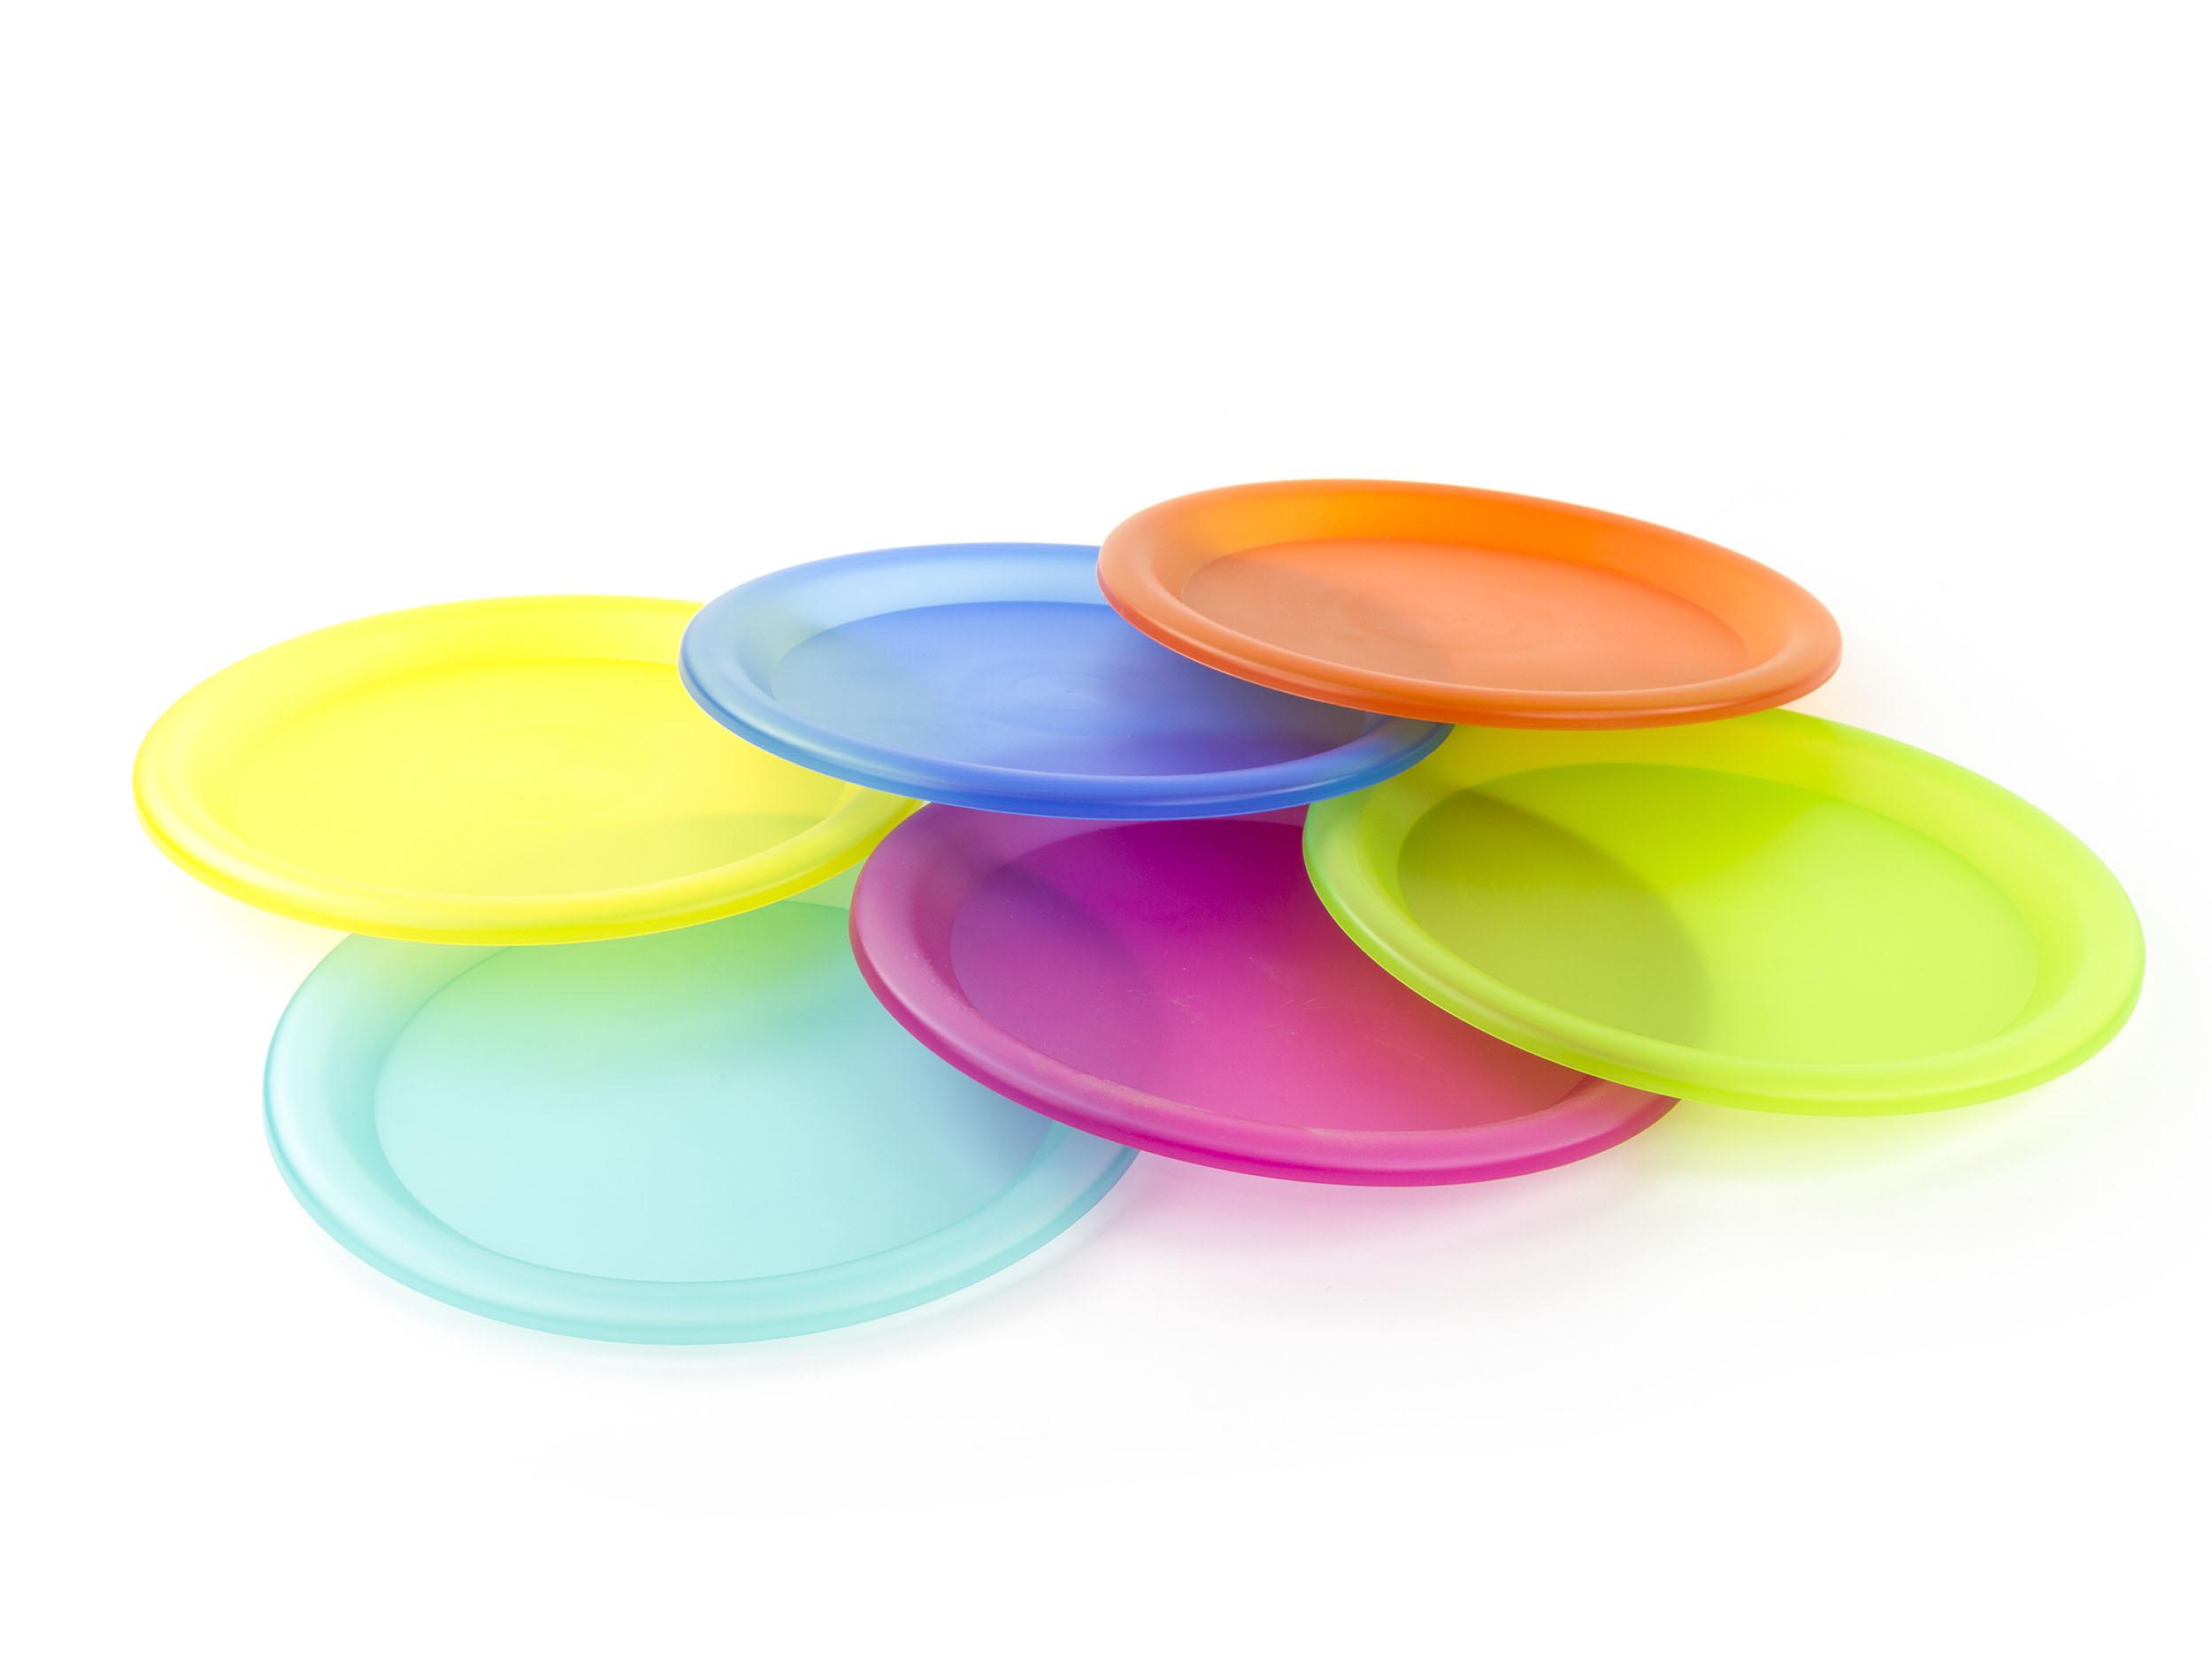 6 Pcs Reusable Plastic Picnic Plates Set in Assorted Colors